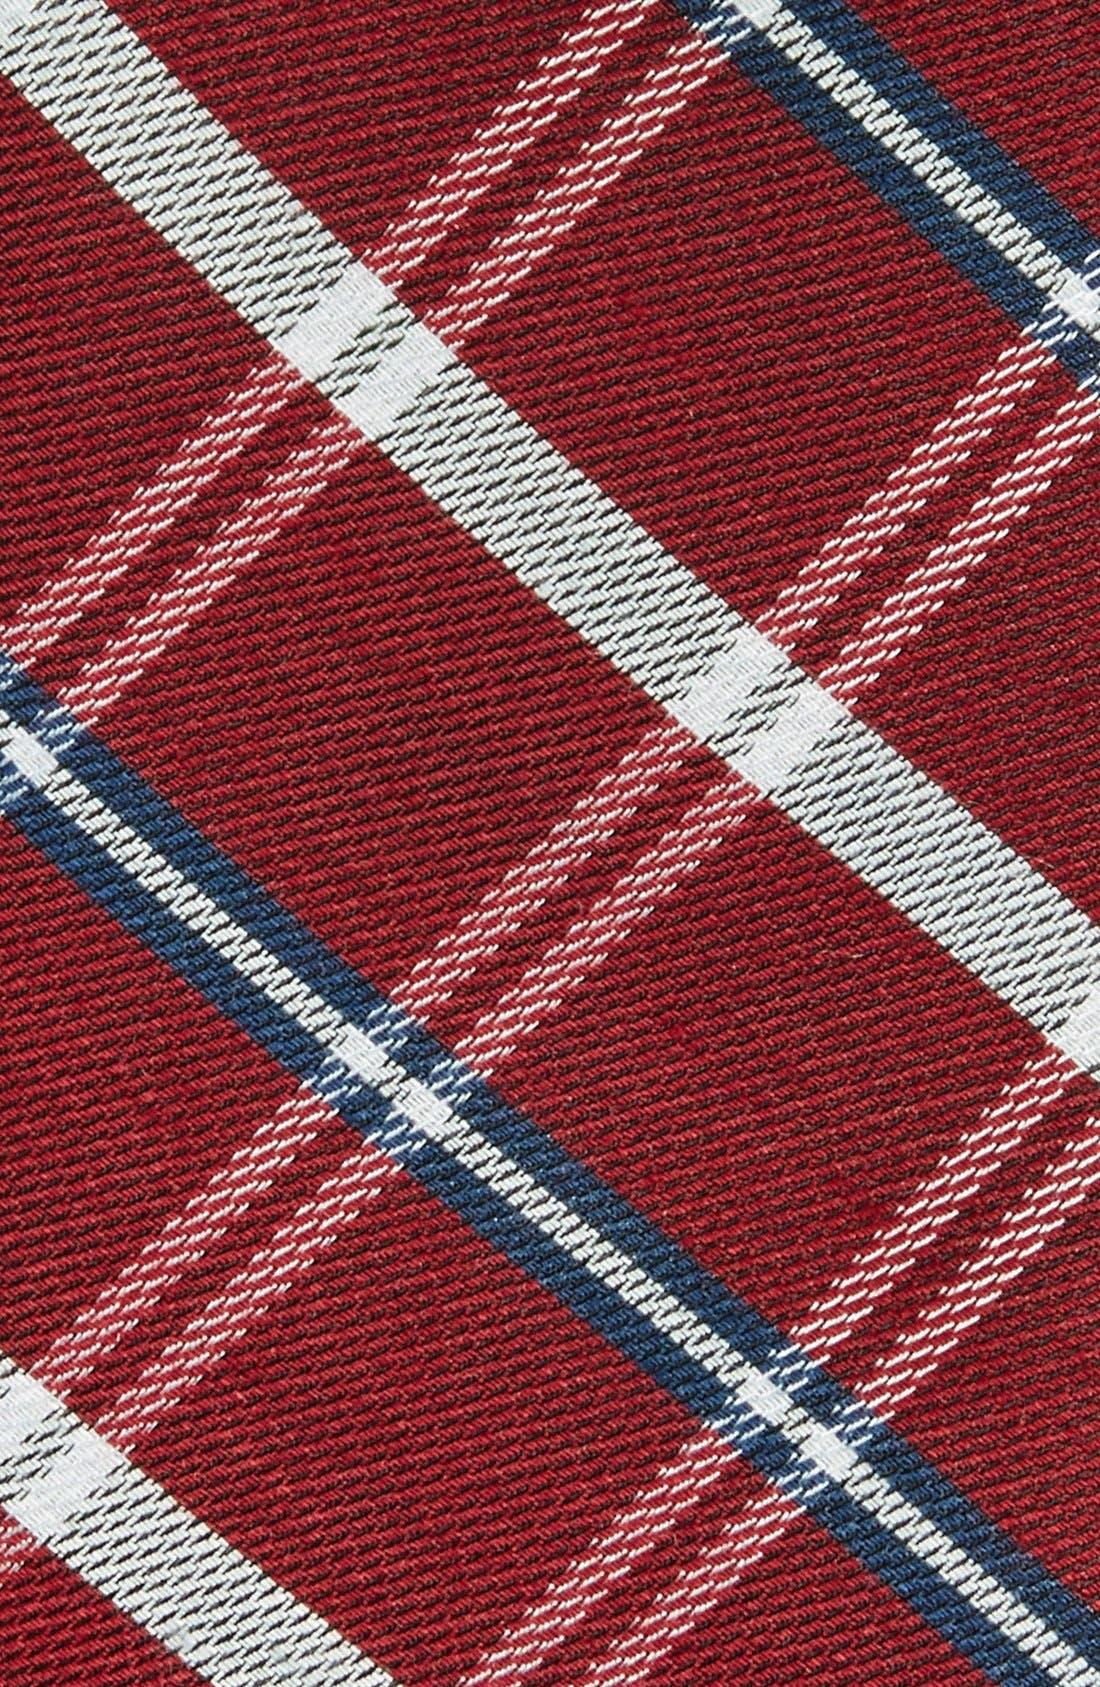 Alternate Image 2  - 1901 'Logan' Plaid Tie